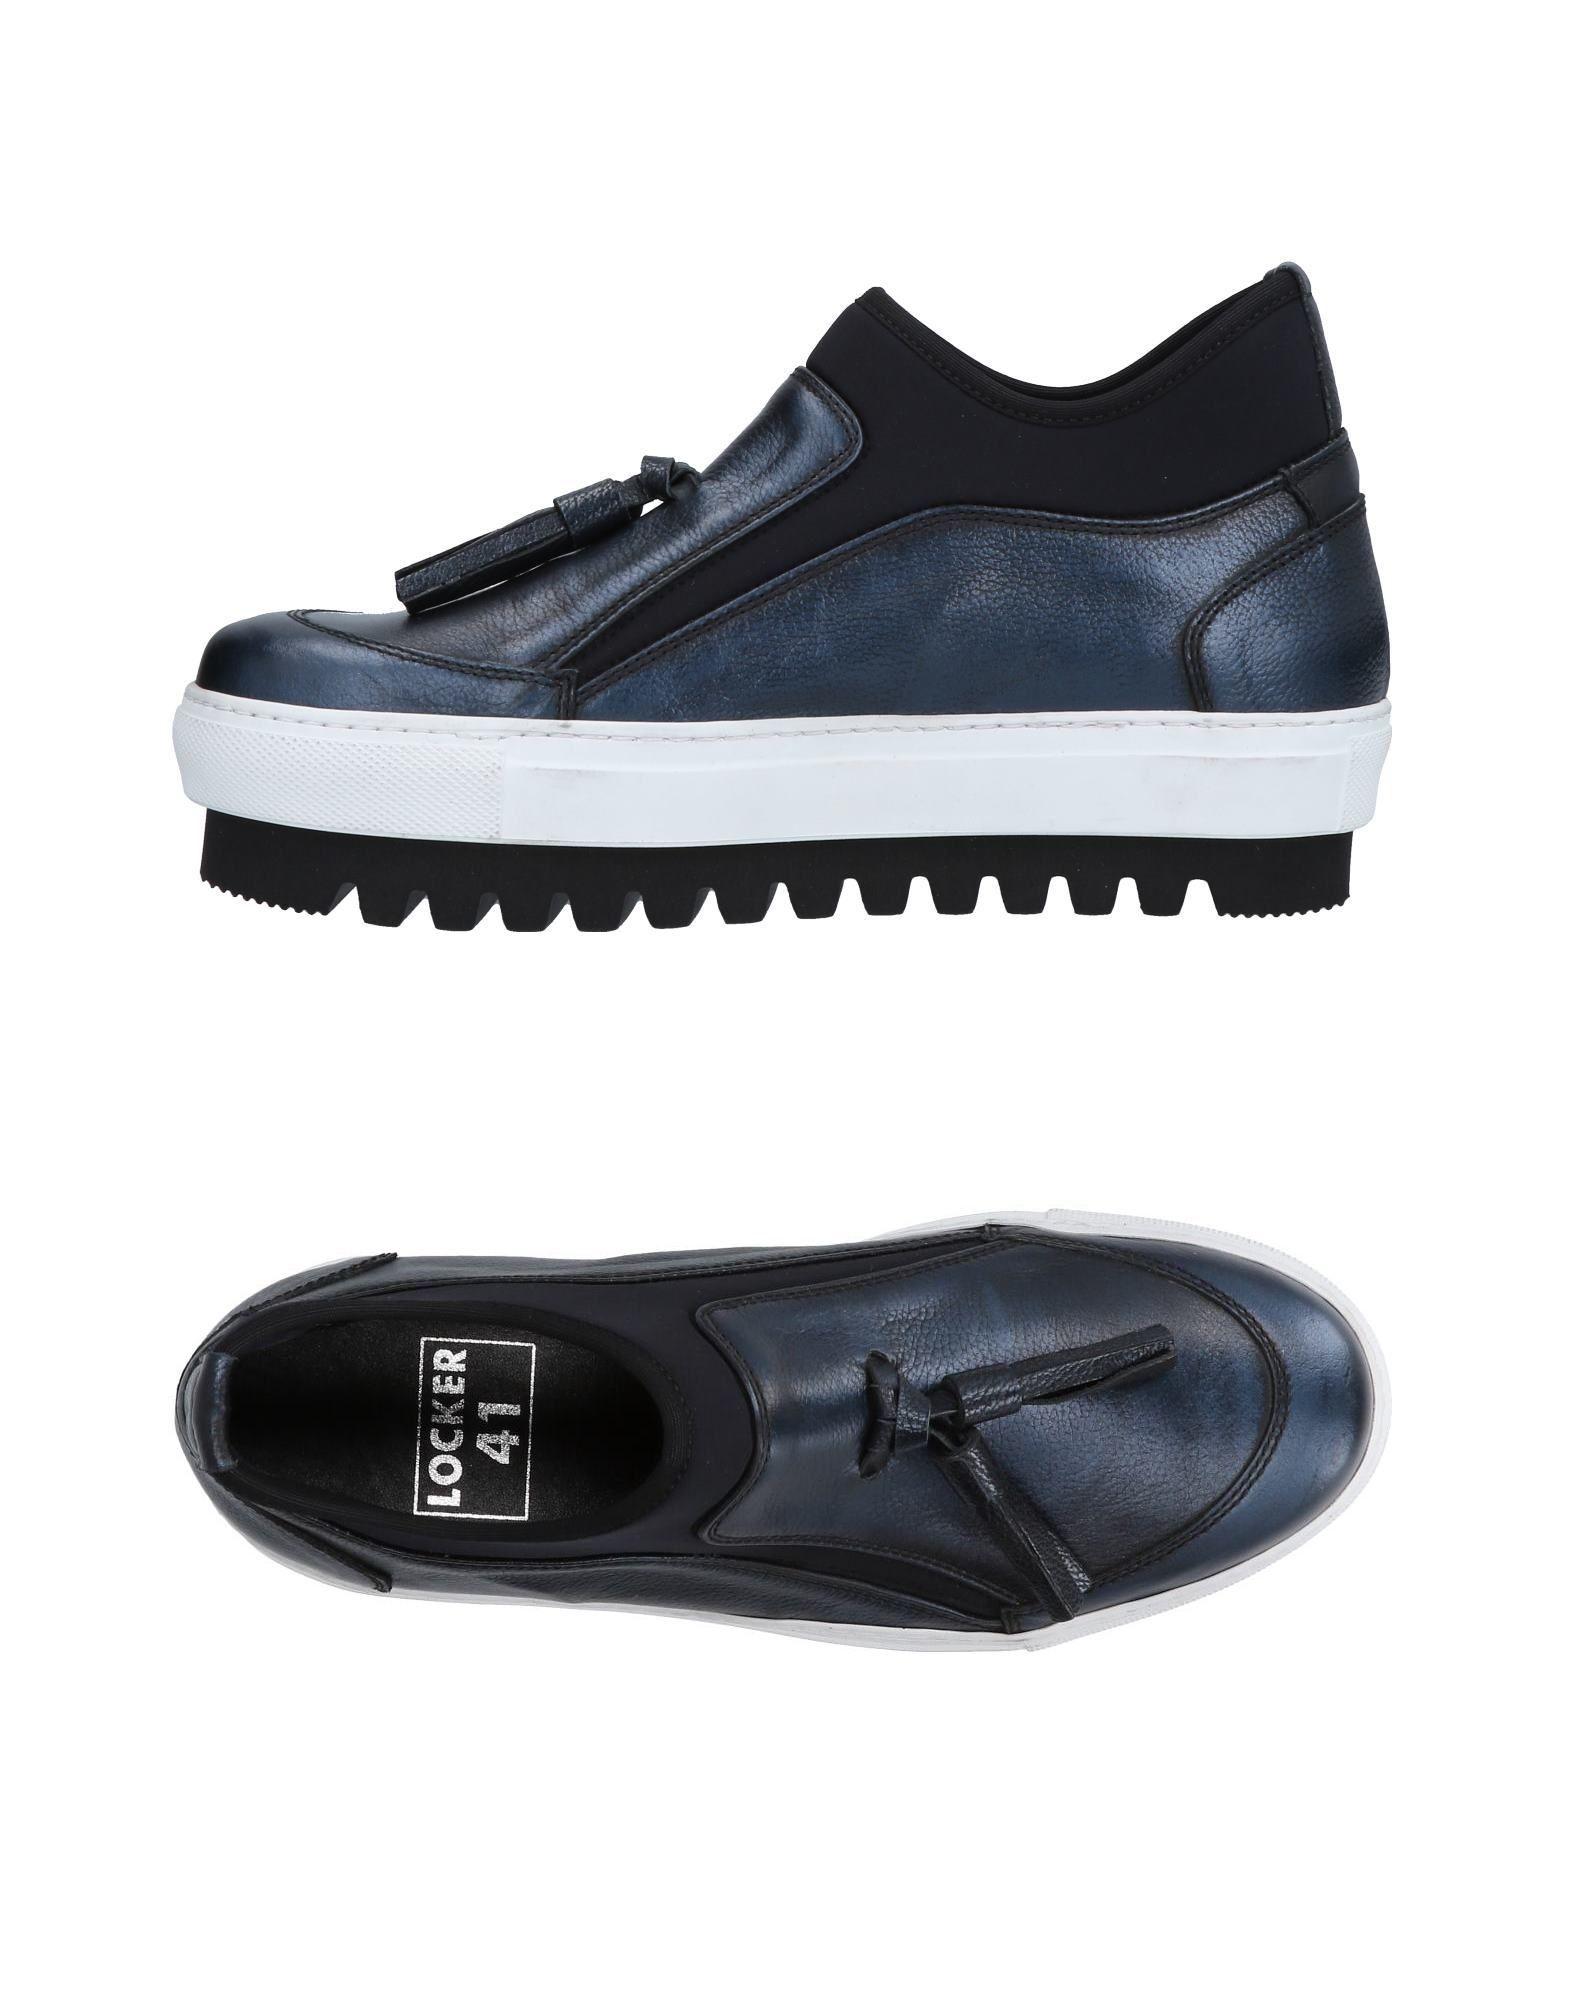 Locker 41 Sneakers Damen  11494819EB Gute Qualität beliebte Schuhe